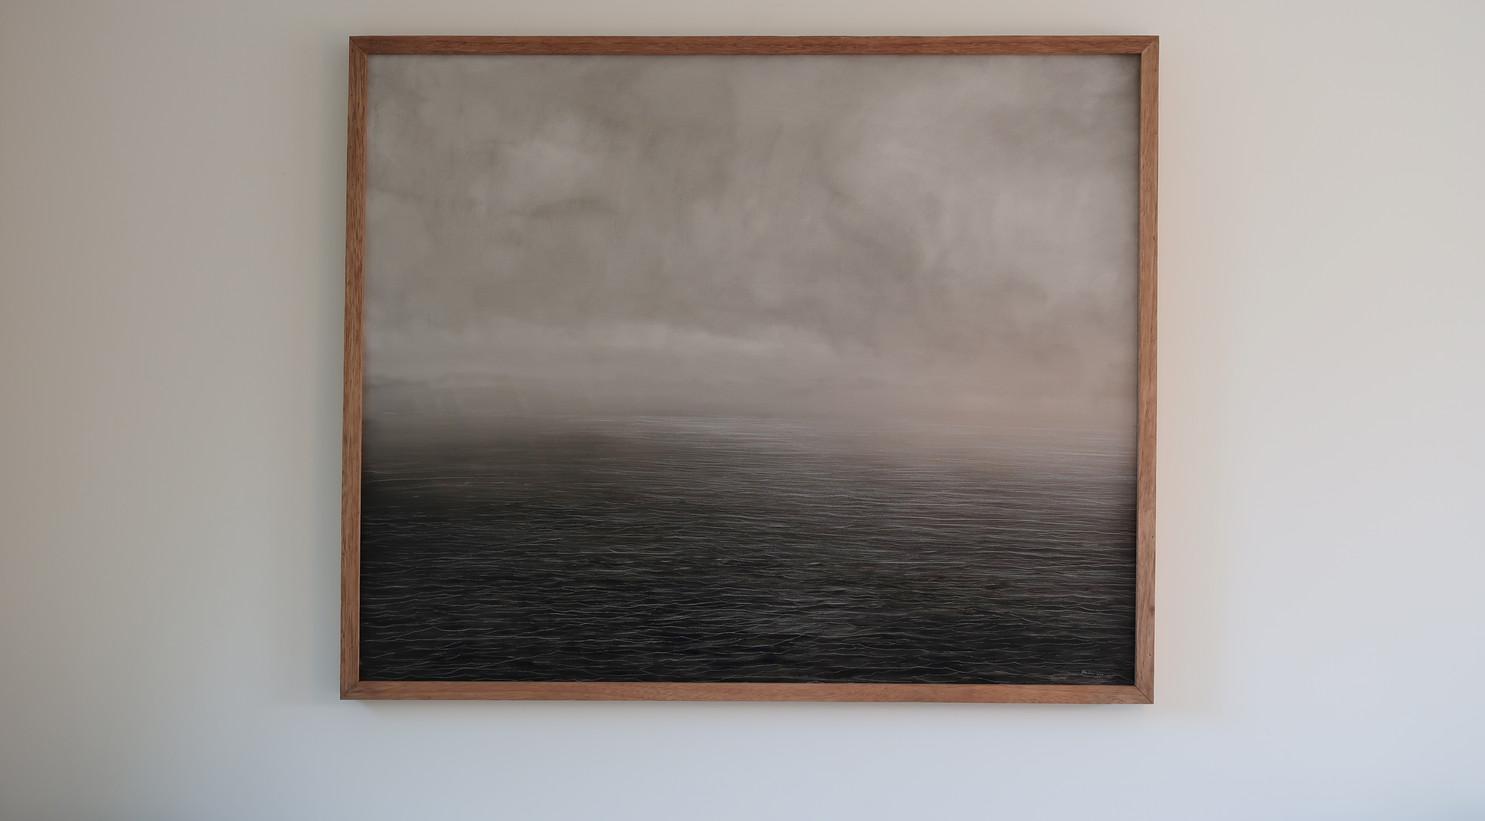 Seascape in the midst, 100x120cm, oil on panel, framed, 2021